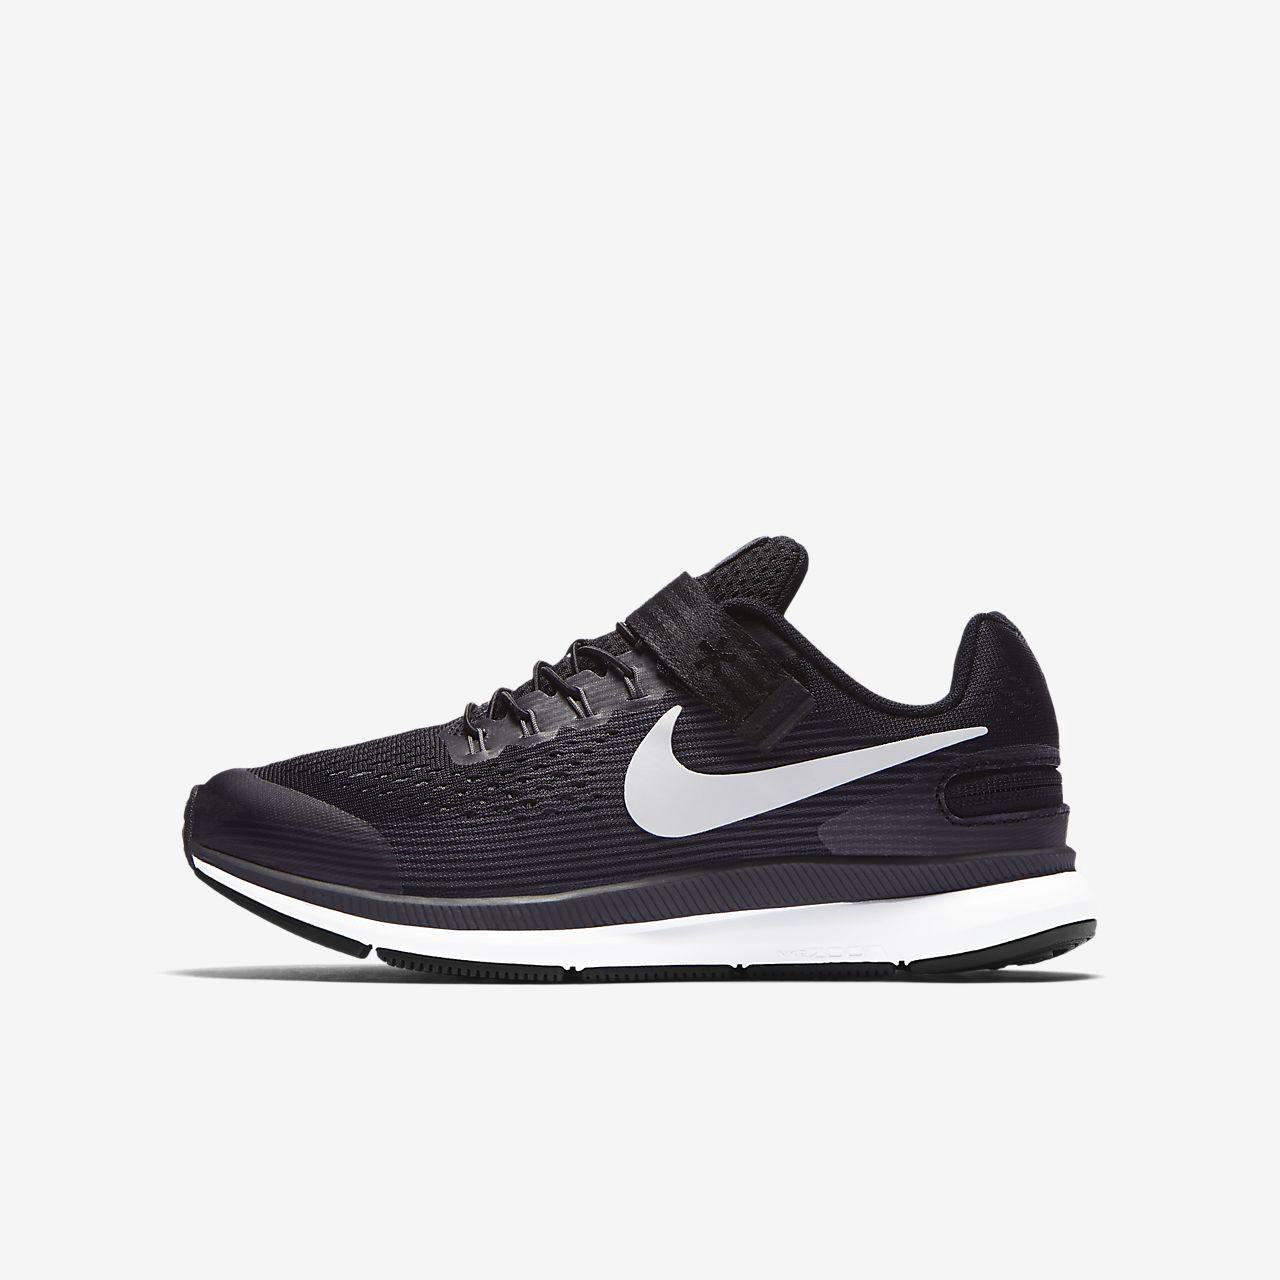 6386220e31e1e3 Nike Zoom Pegasus 34 FlyEase Big Kids  Running Shoe (Extra-Wide) by ...